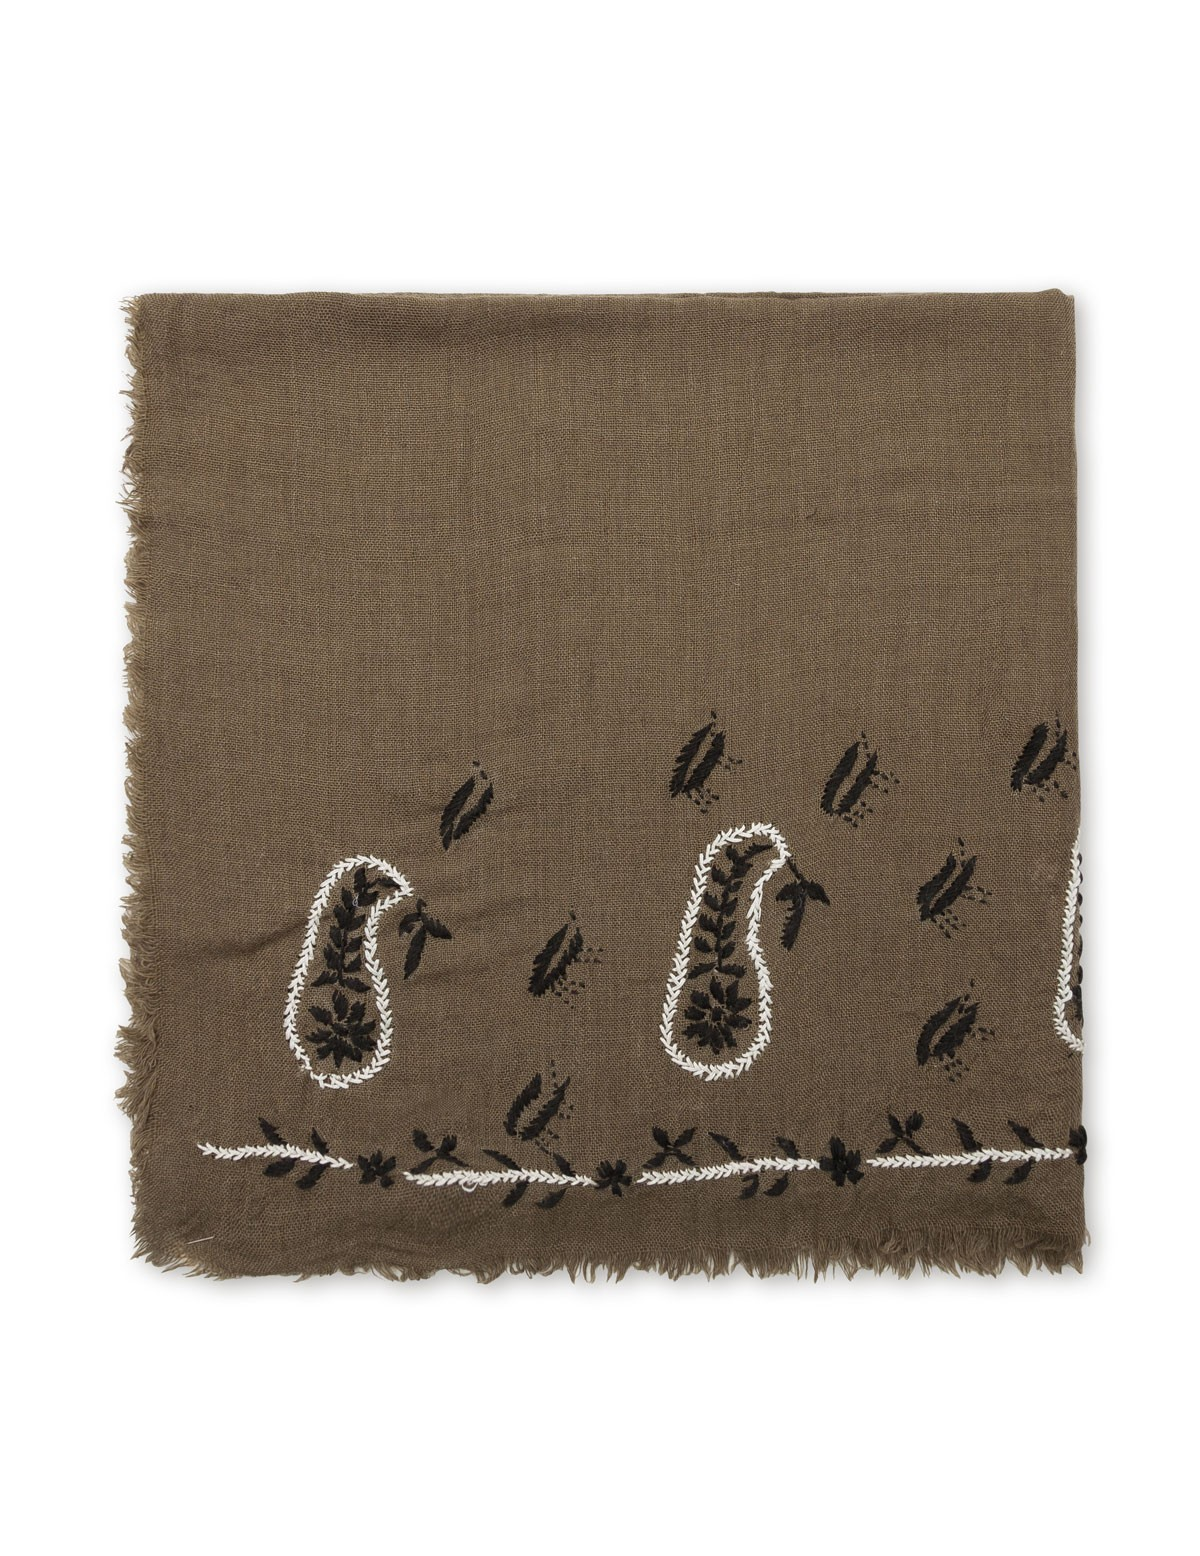 Pañuelo lana bordado